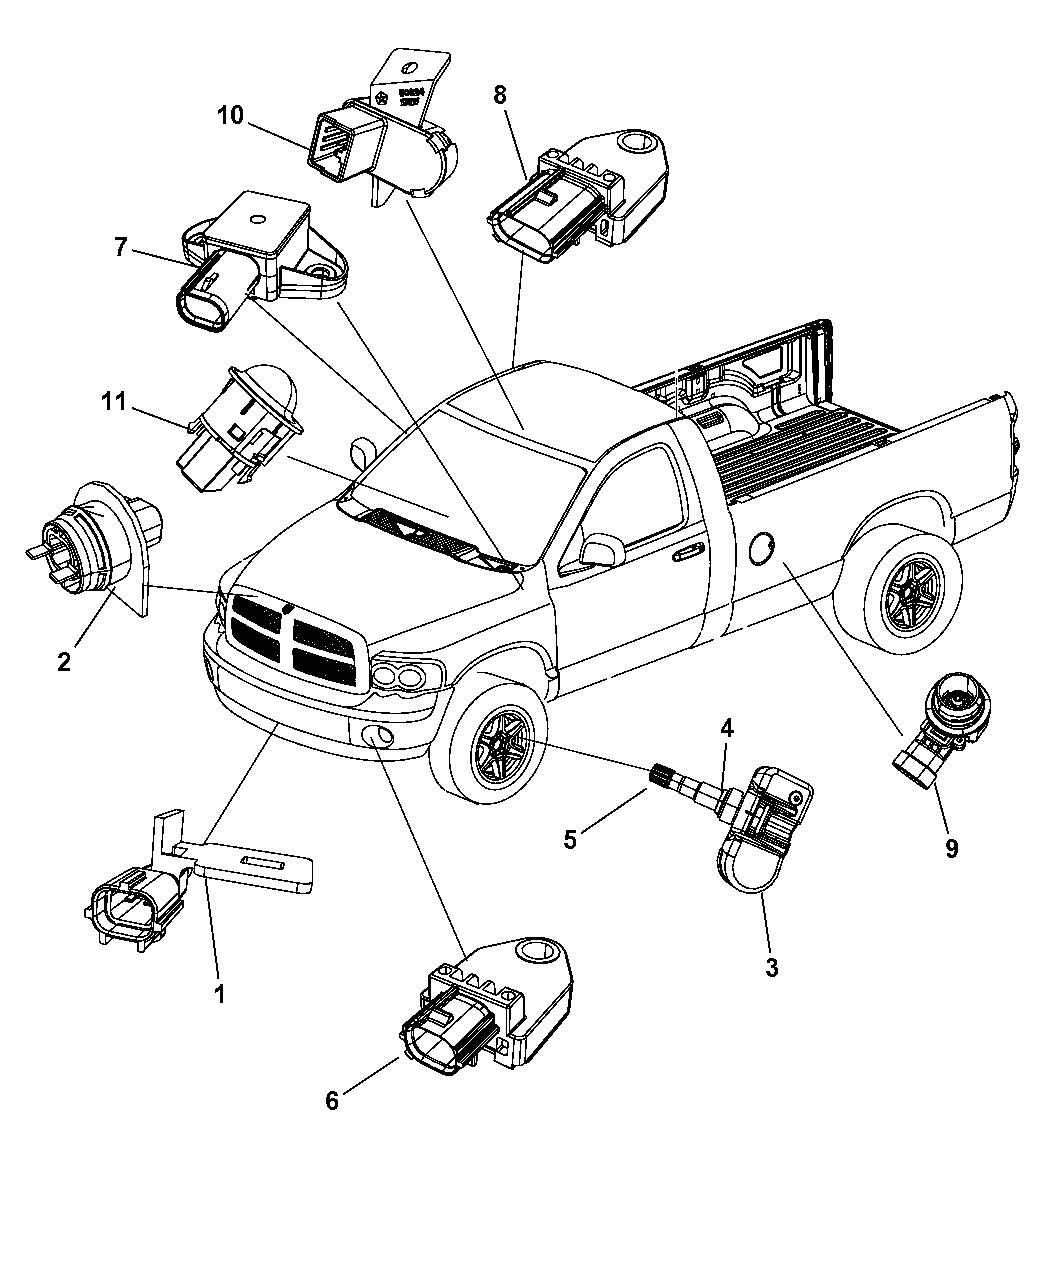 2011 Ram 1500 Sensors Body Mopar Parts Giant Lights Wiring Diagram